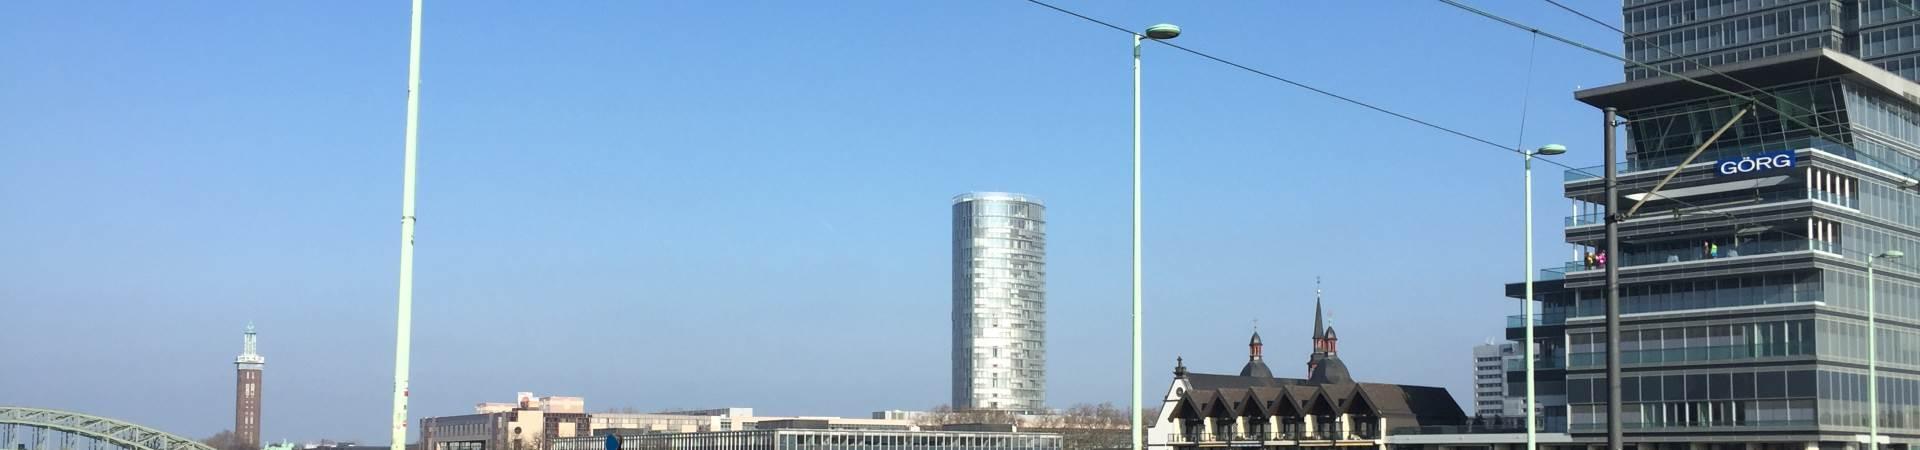 Videoüberwachung Köln